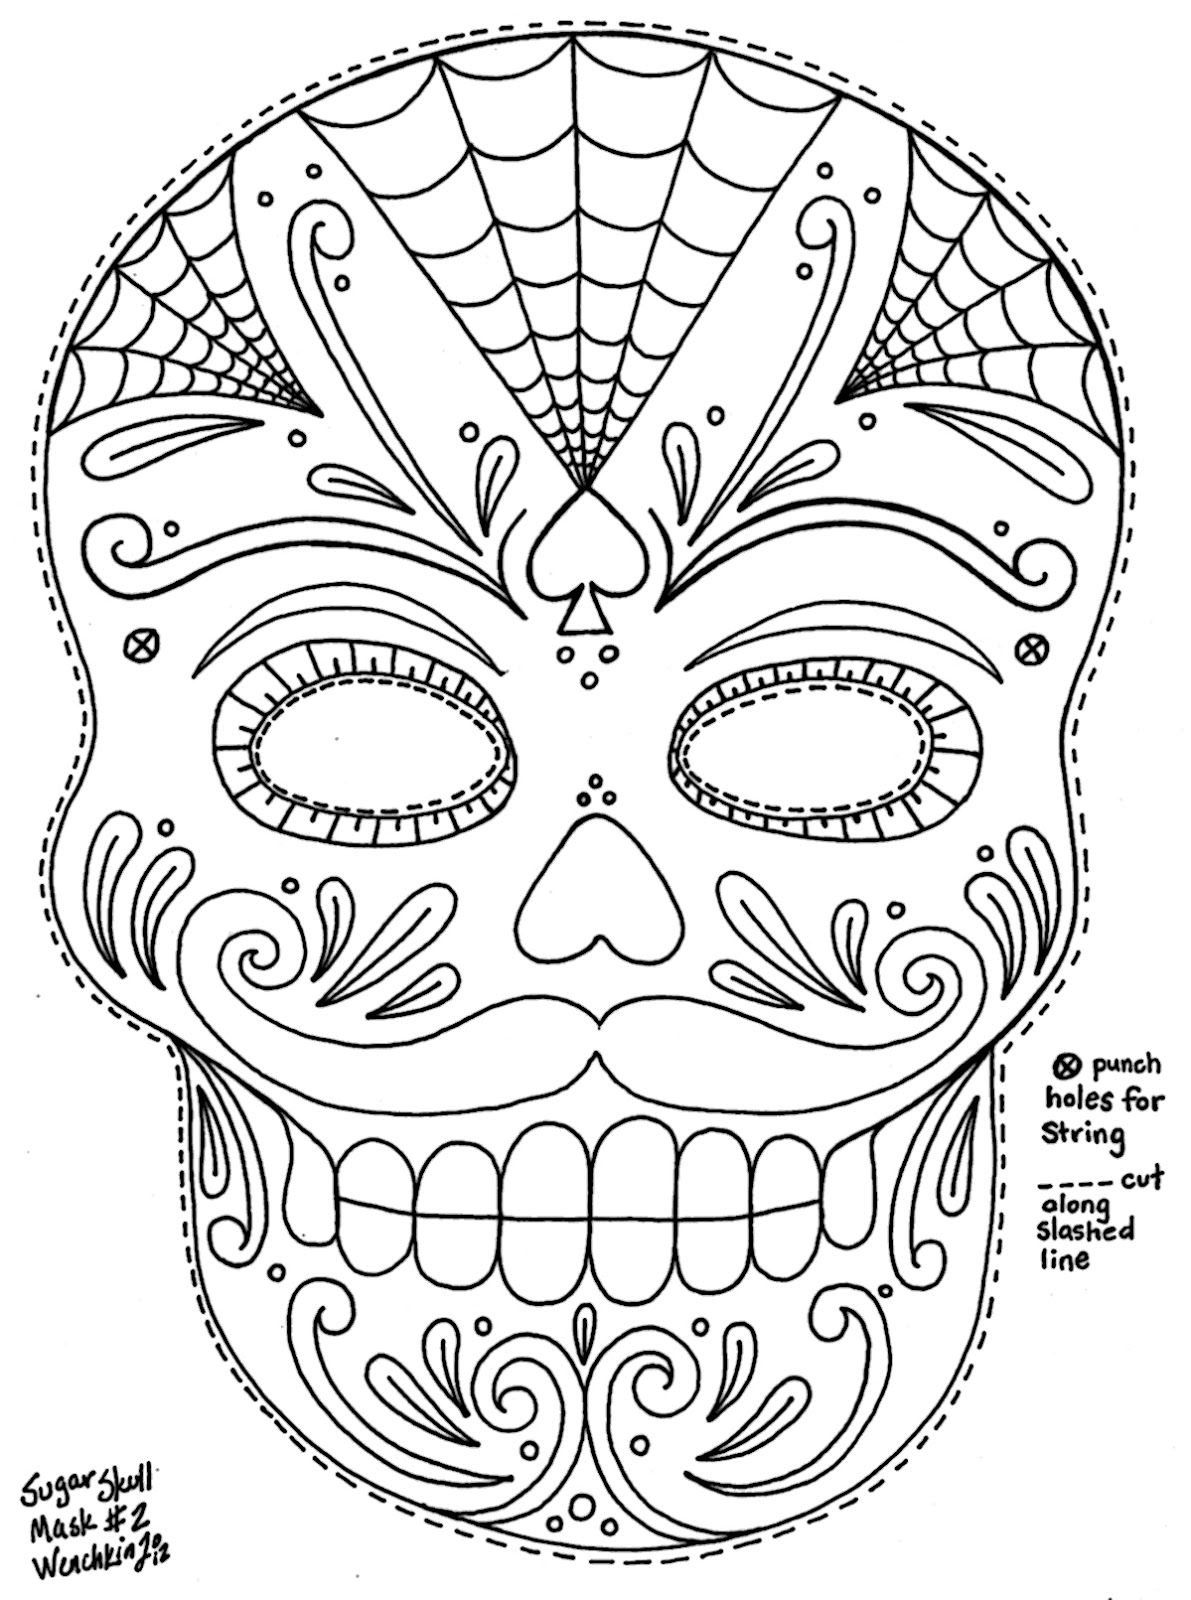 Mexican Sun Drawing At Getdrawings